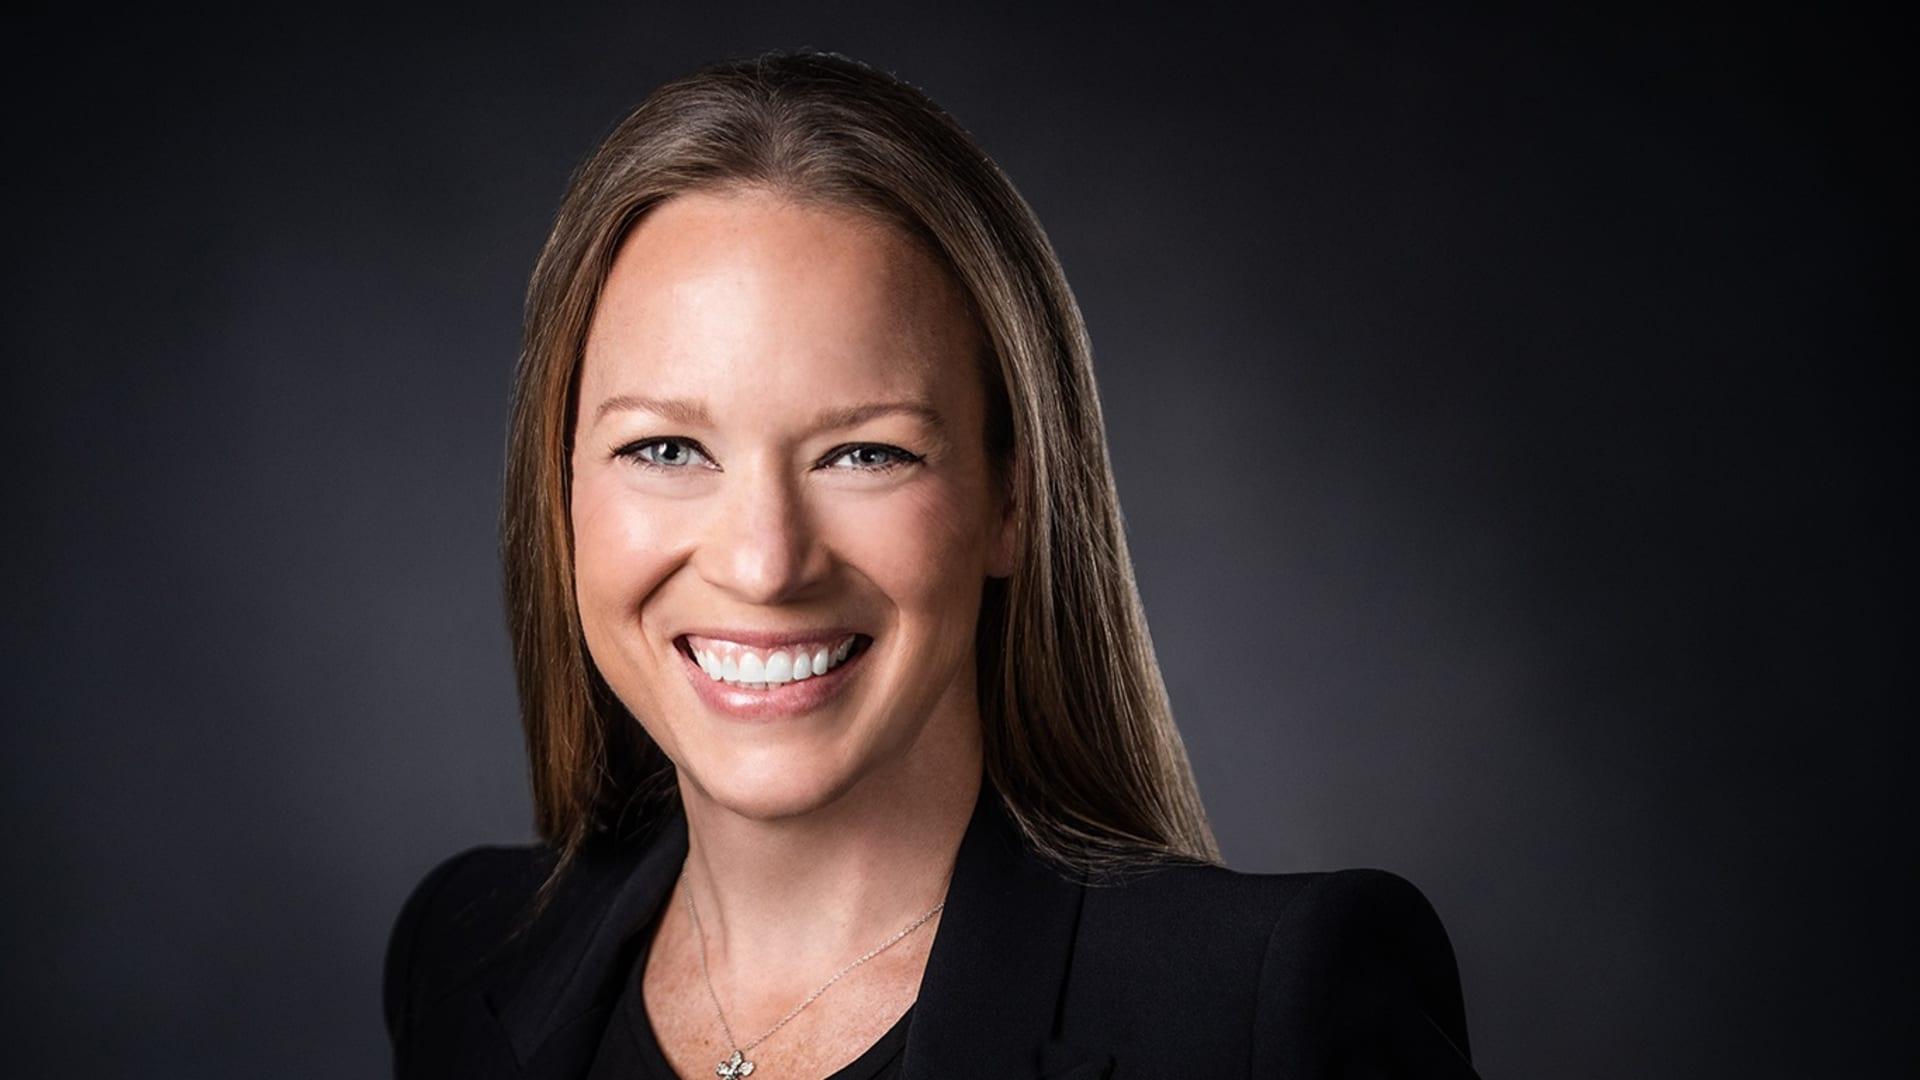 YouTube's VP of content partnerships Kelly Merryman.